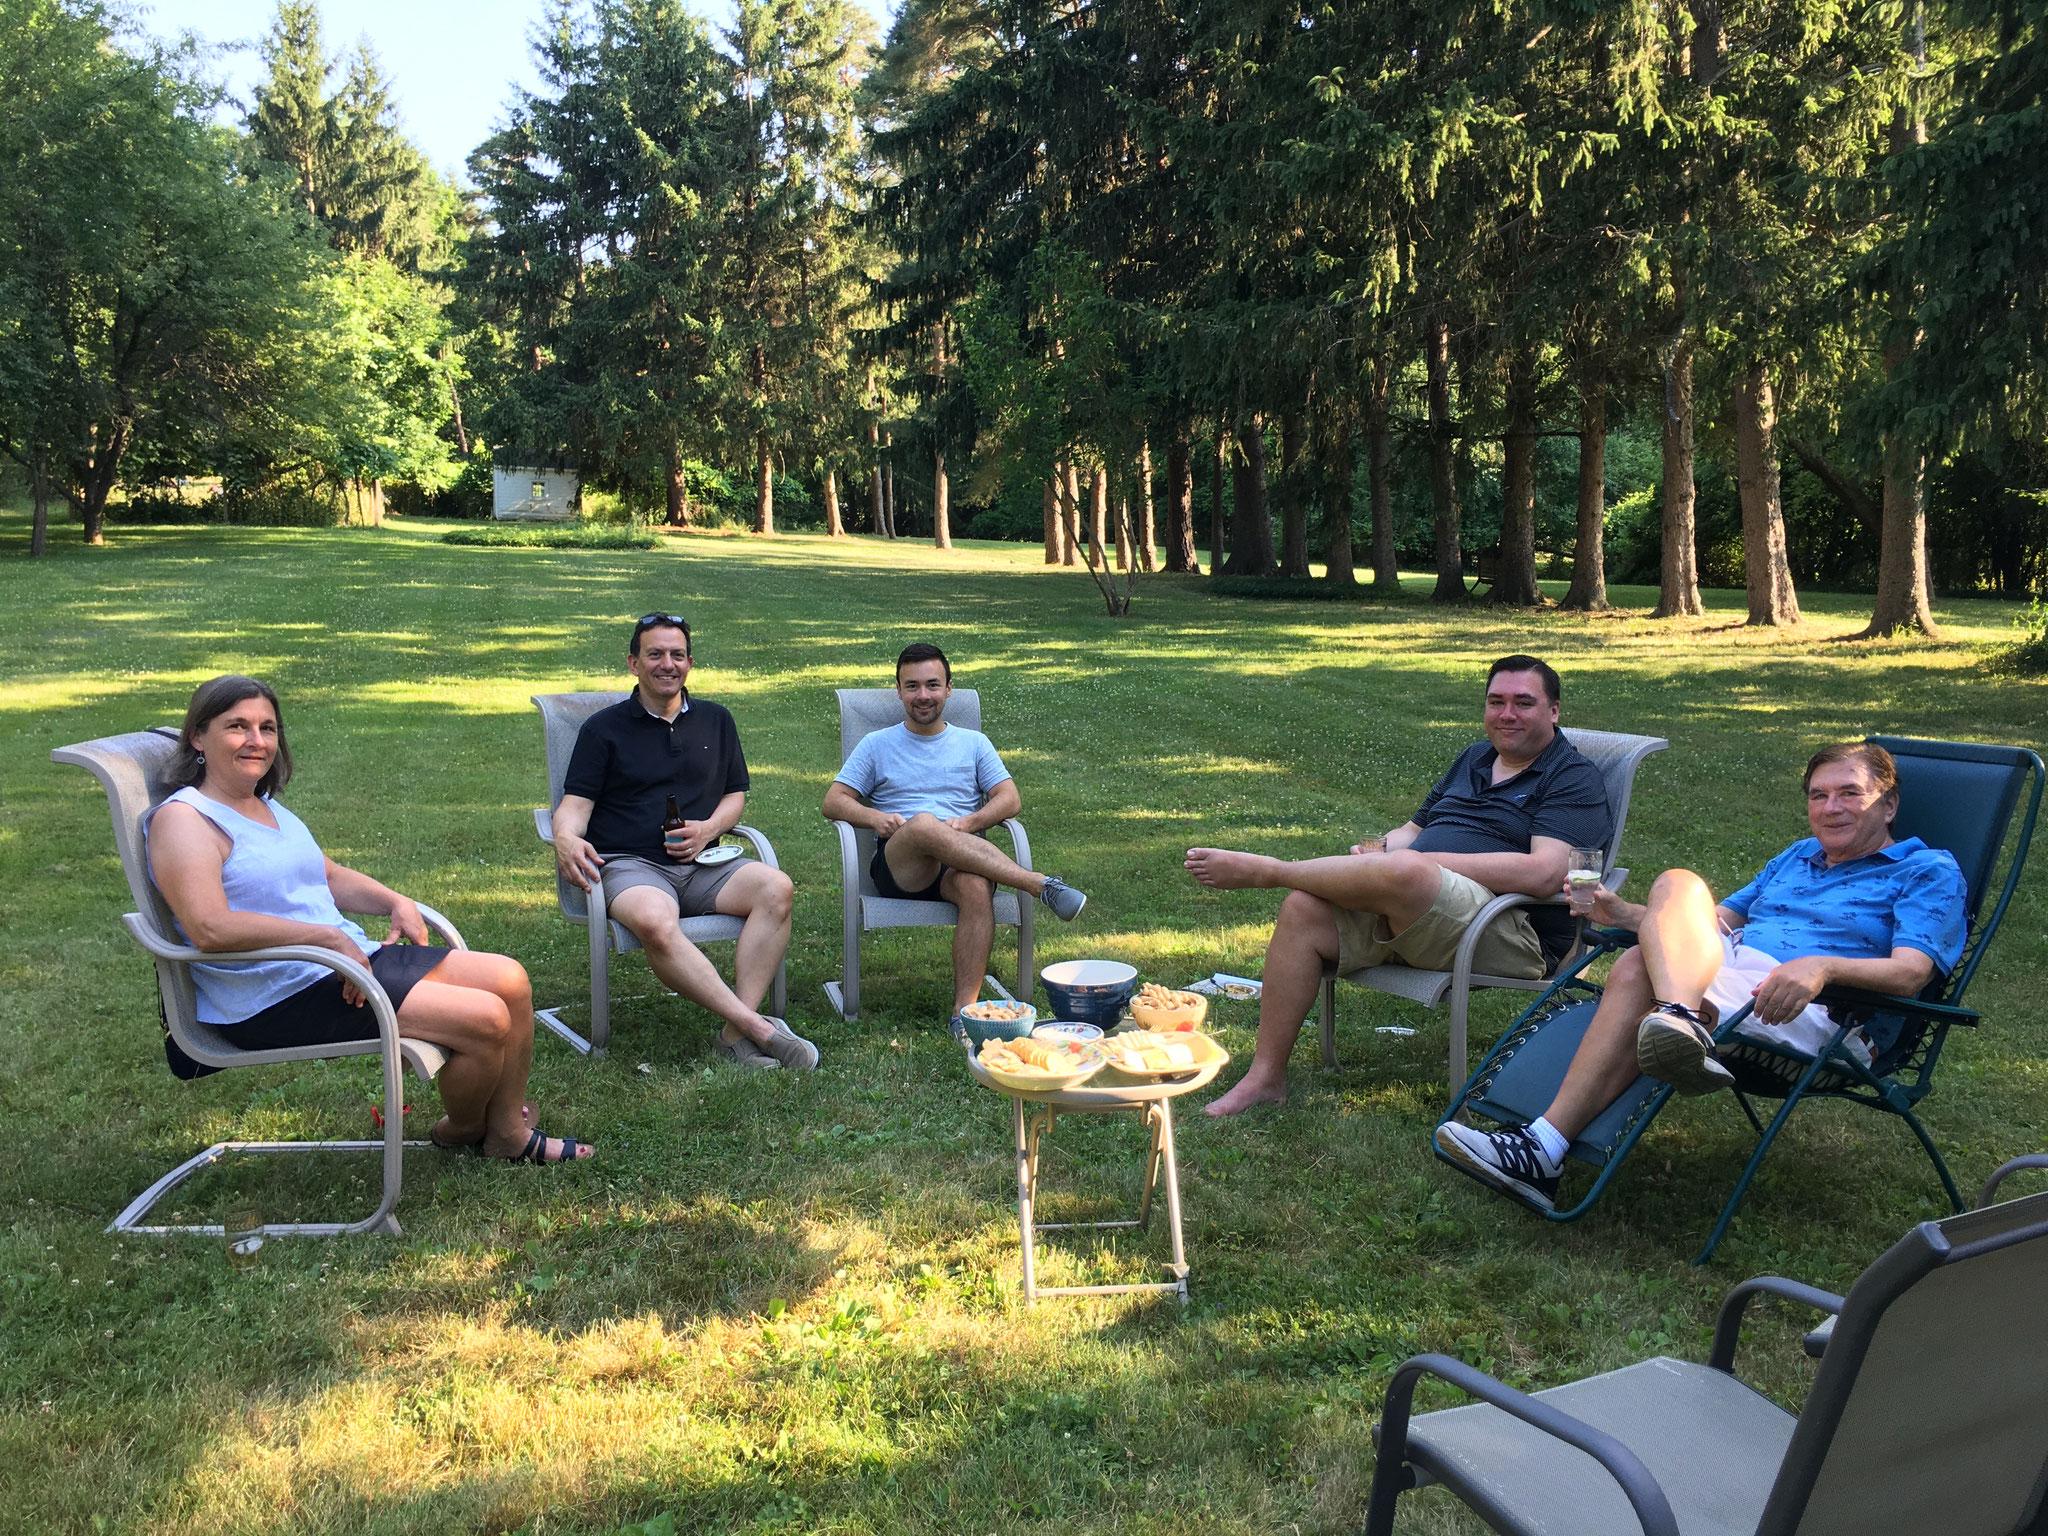 Cyndi, Nick, Trevan, Greg, & John  7-2020 Syracuse, NY